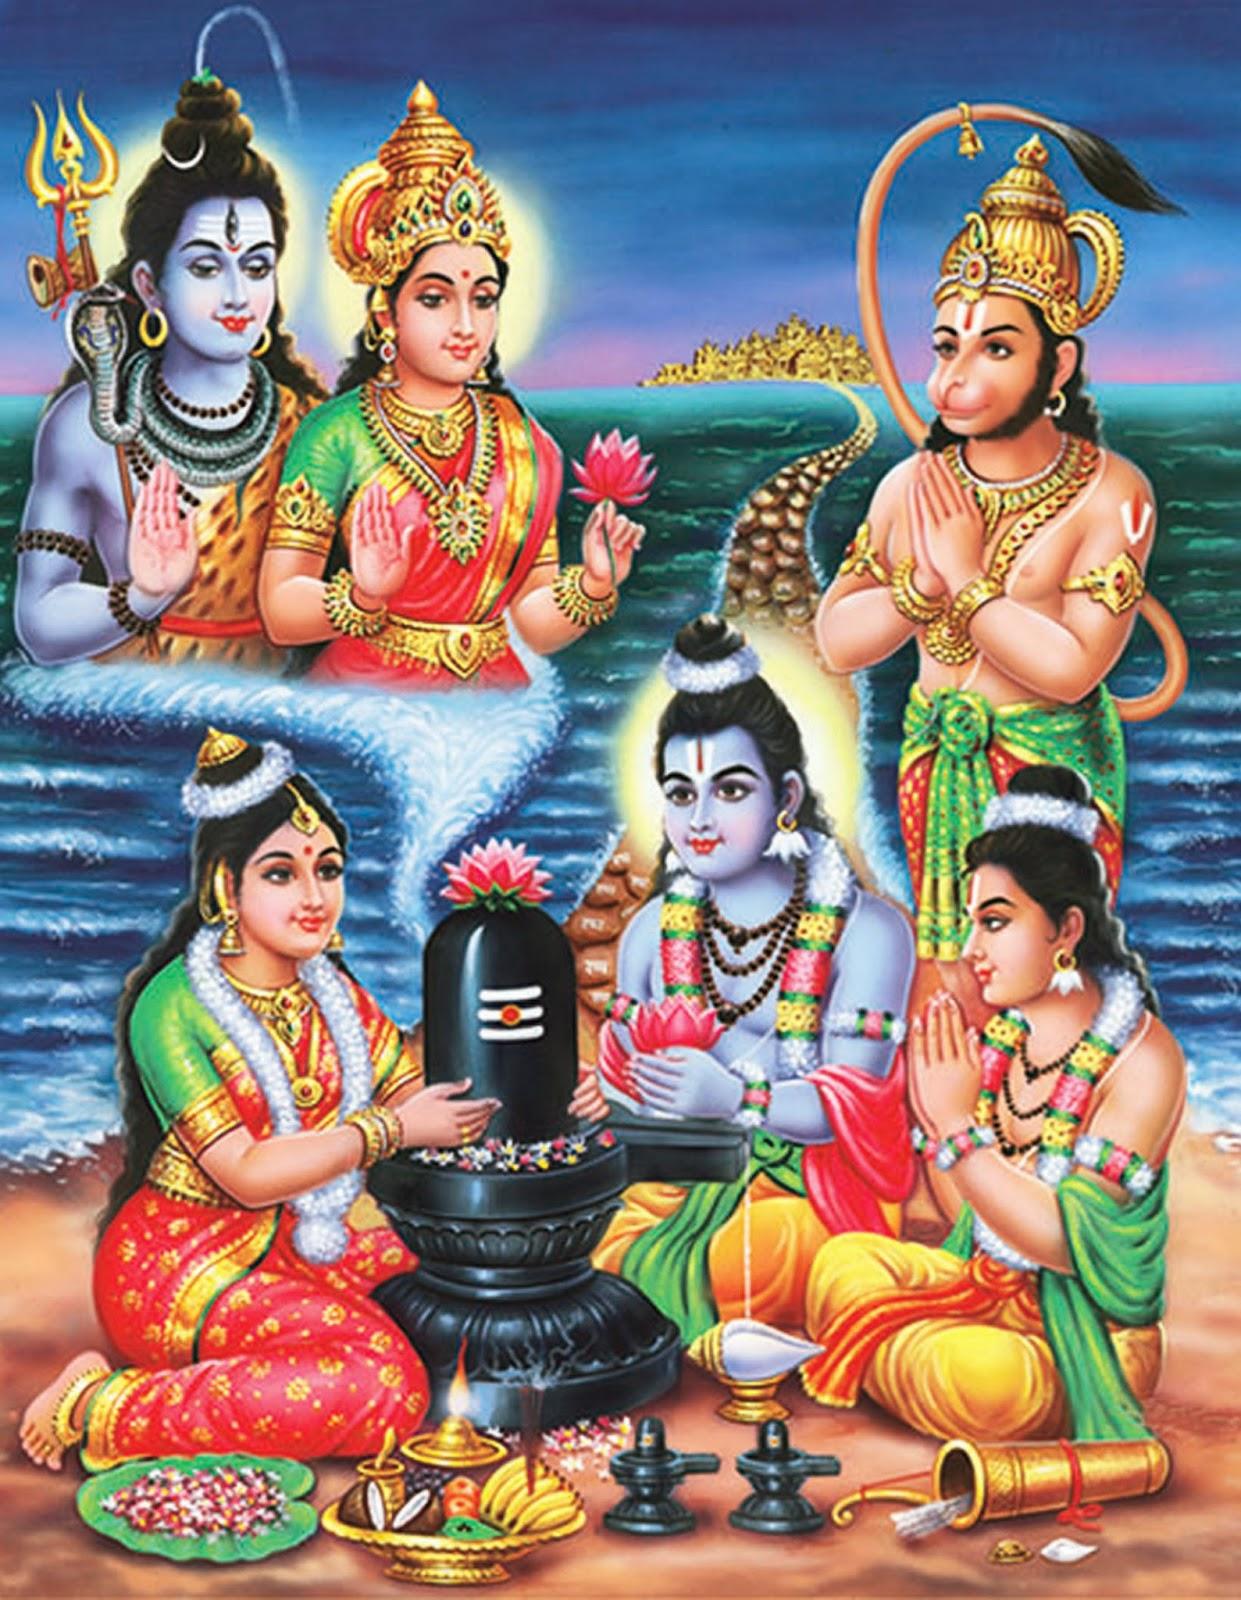 Maa Tara Wallpaper Hd Gods Leaders Images Drawings Gods Of India Amp Hindu Gods